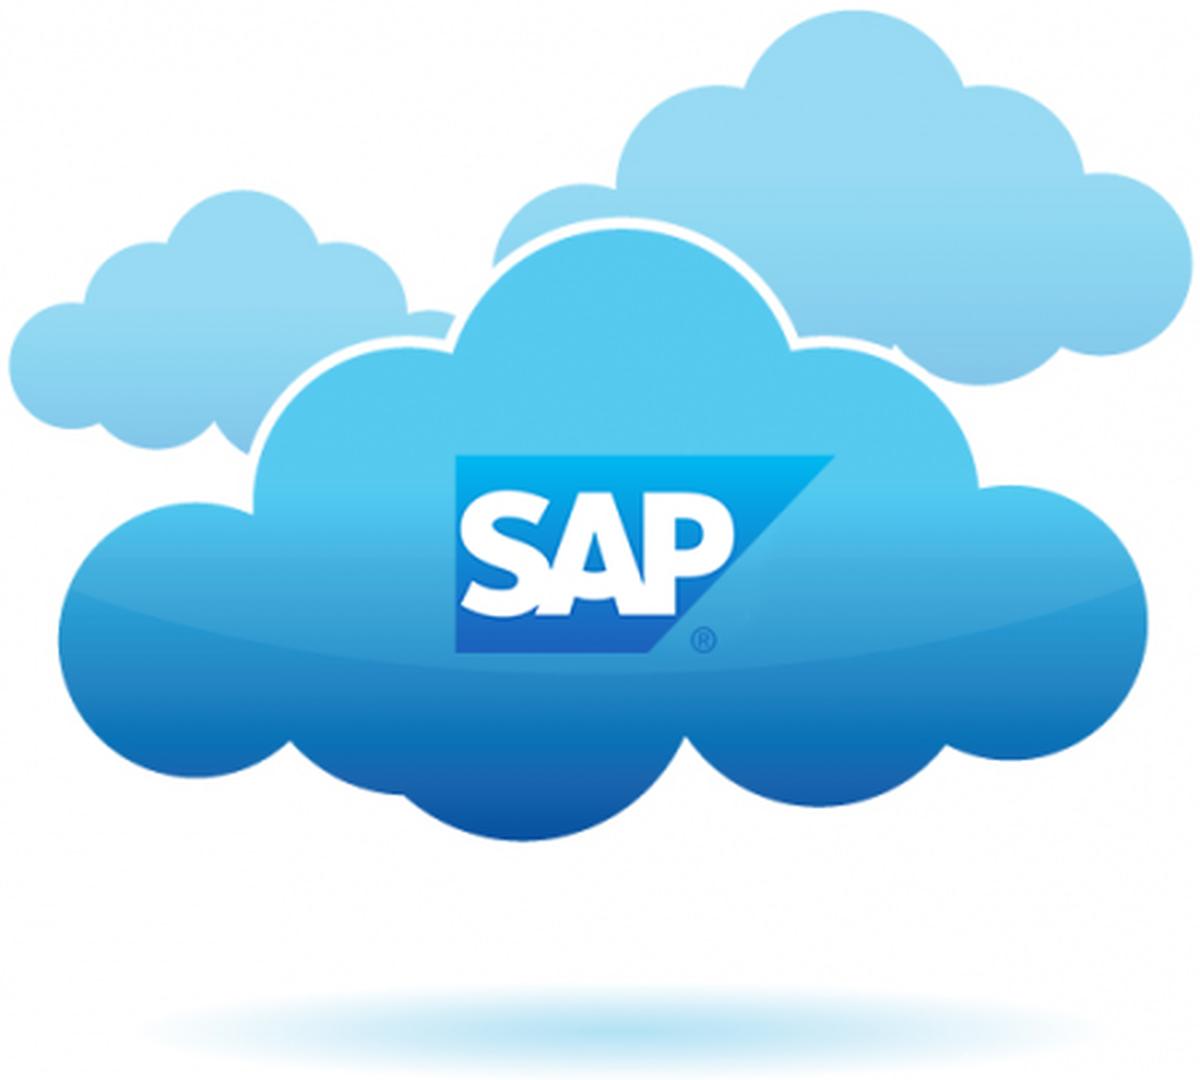 SAP S/4 HANA Cloud harnesses AI to offer an \'intelligent.